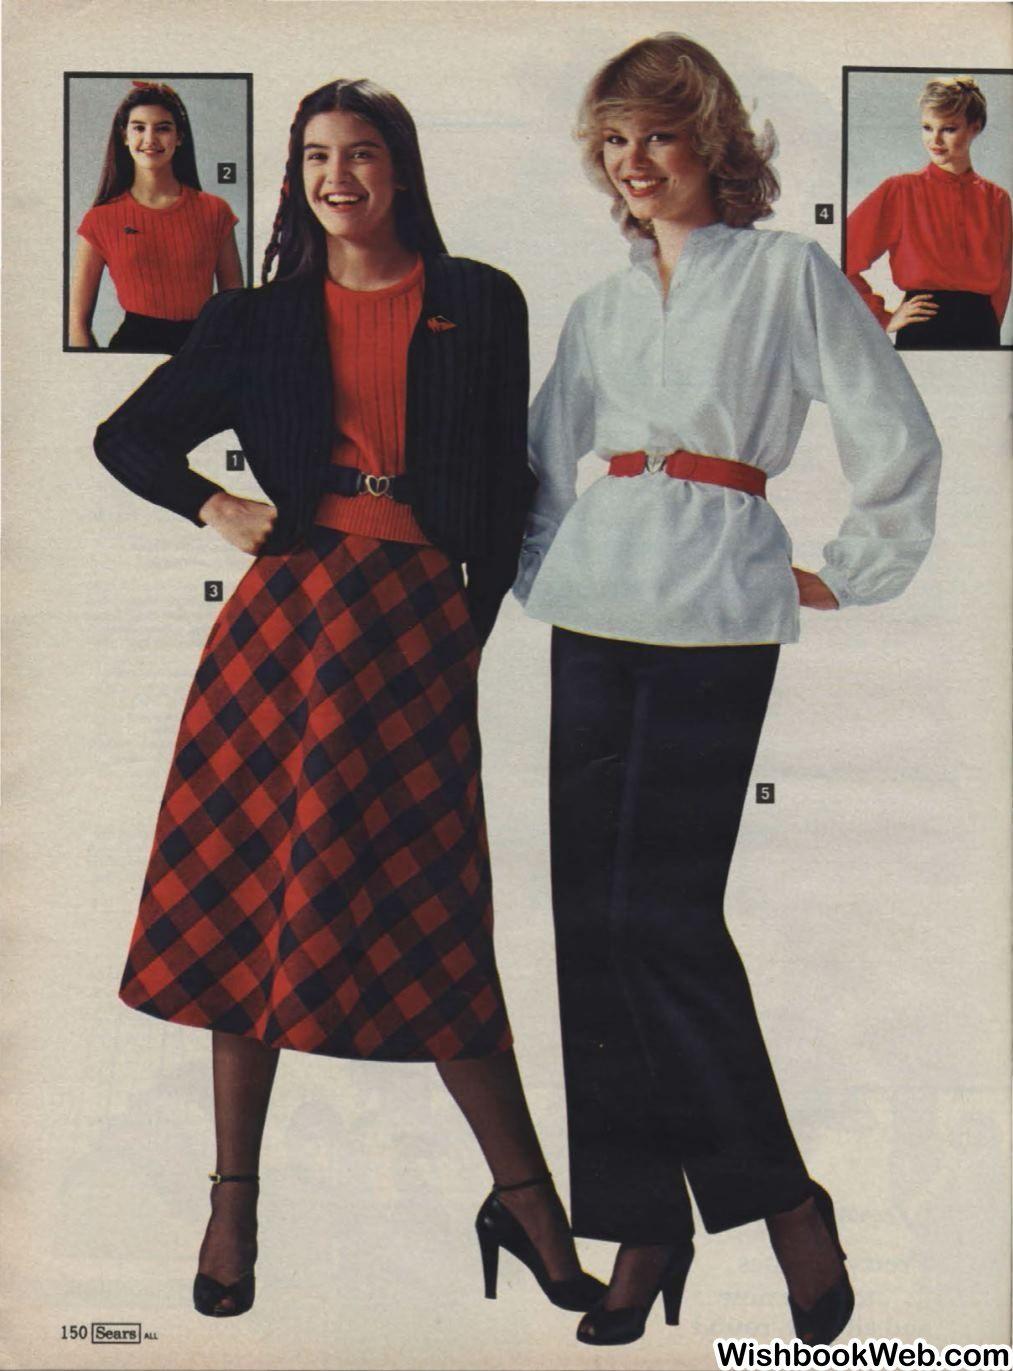 ff758a552d 1979 Sears Wishbook 1980s Christmas, Christmas Catalogs, 80s Fashion,  Vintage Fashion, Womens